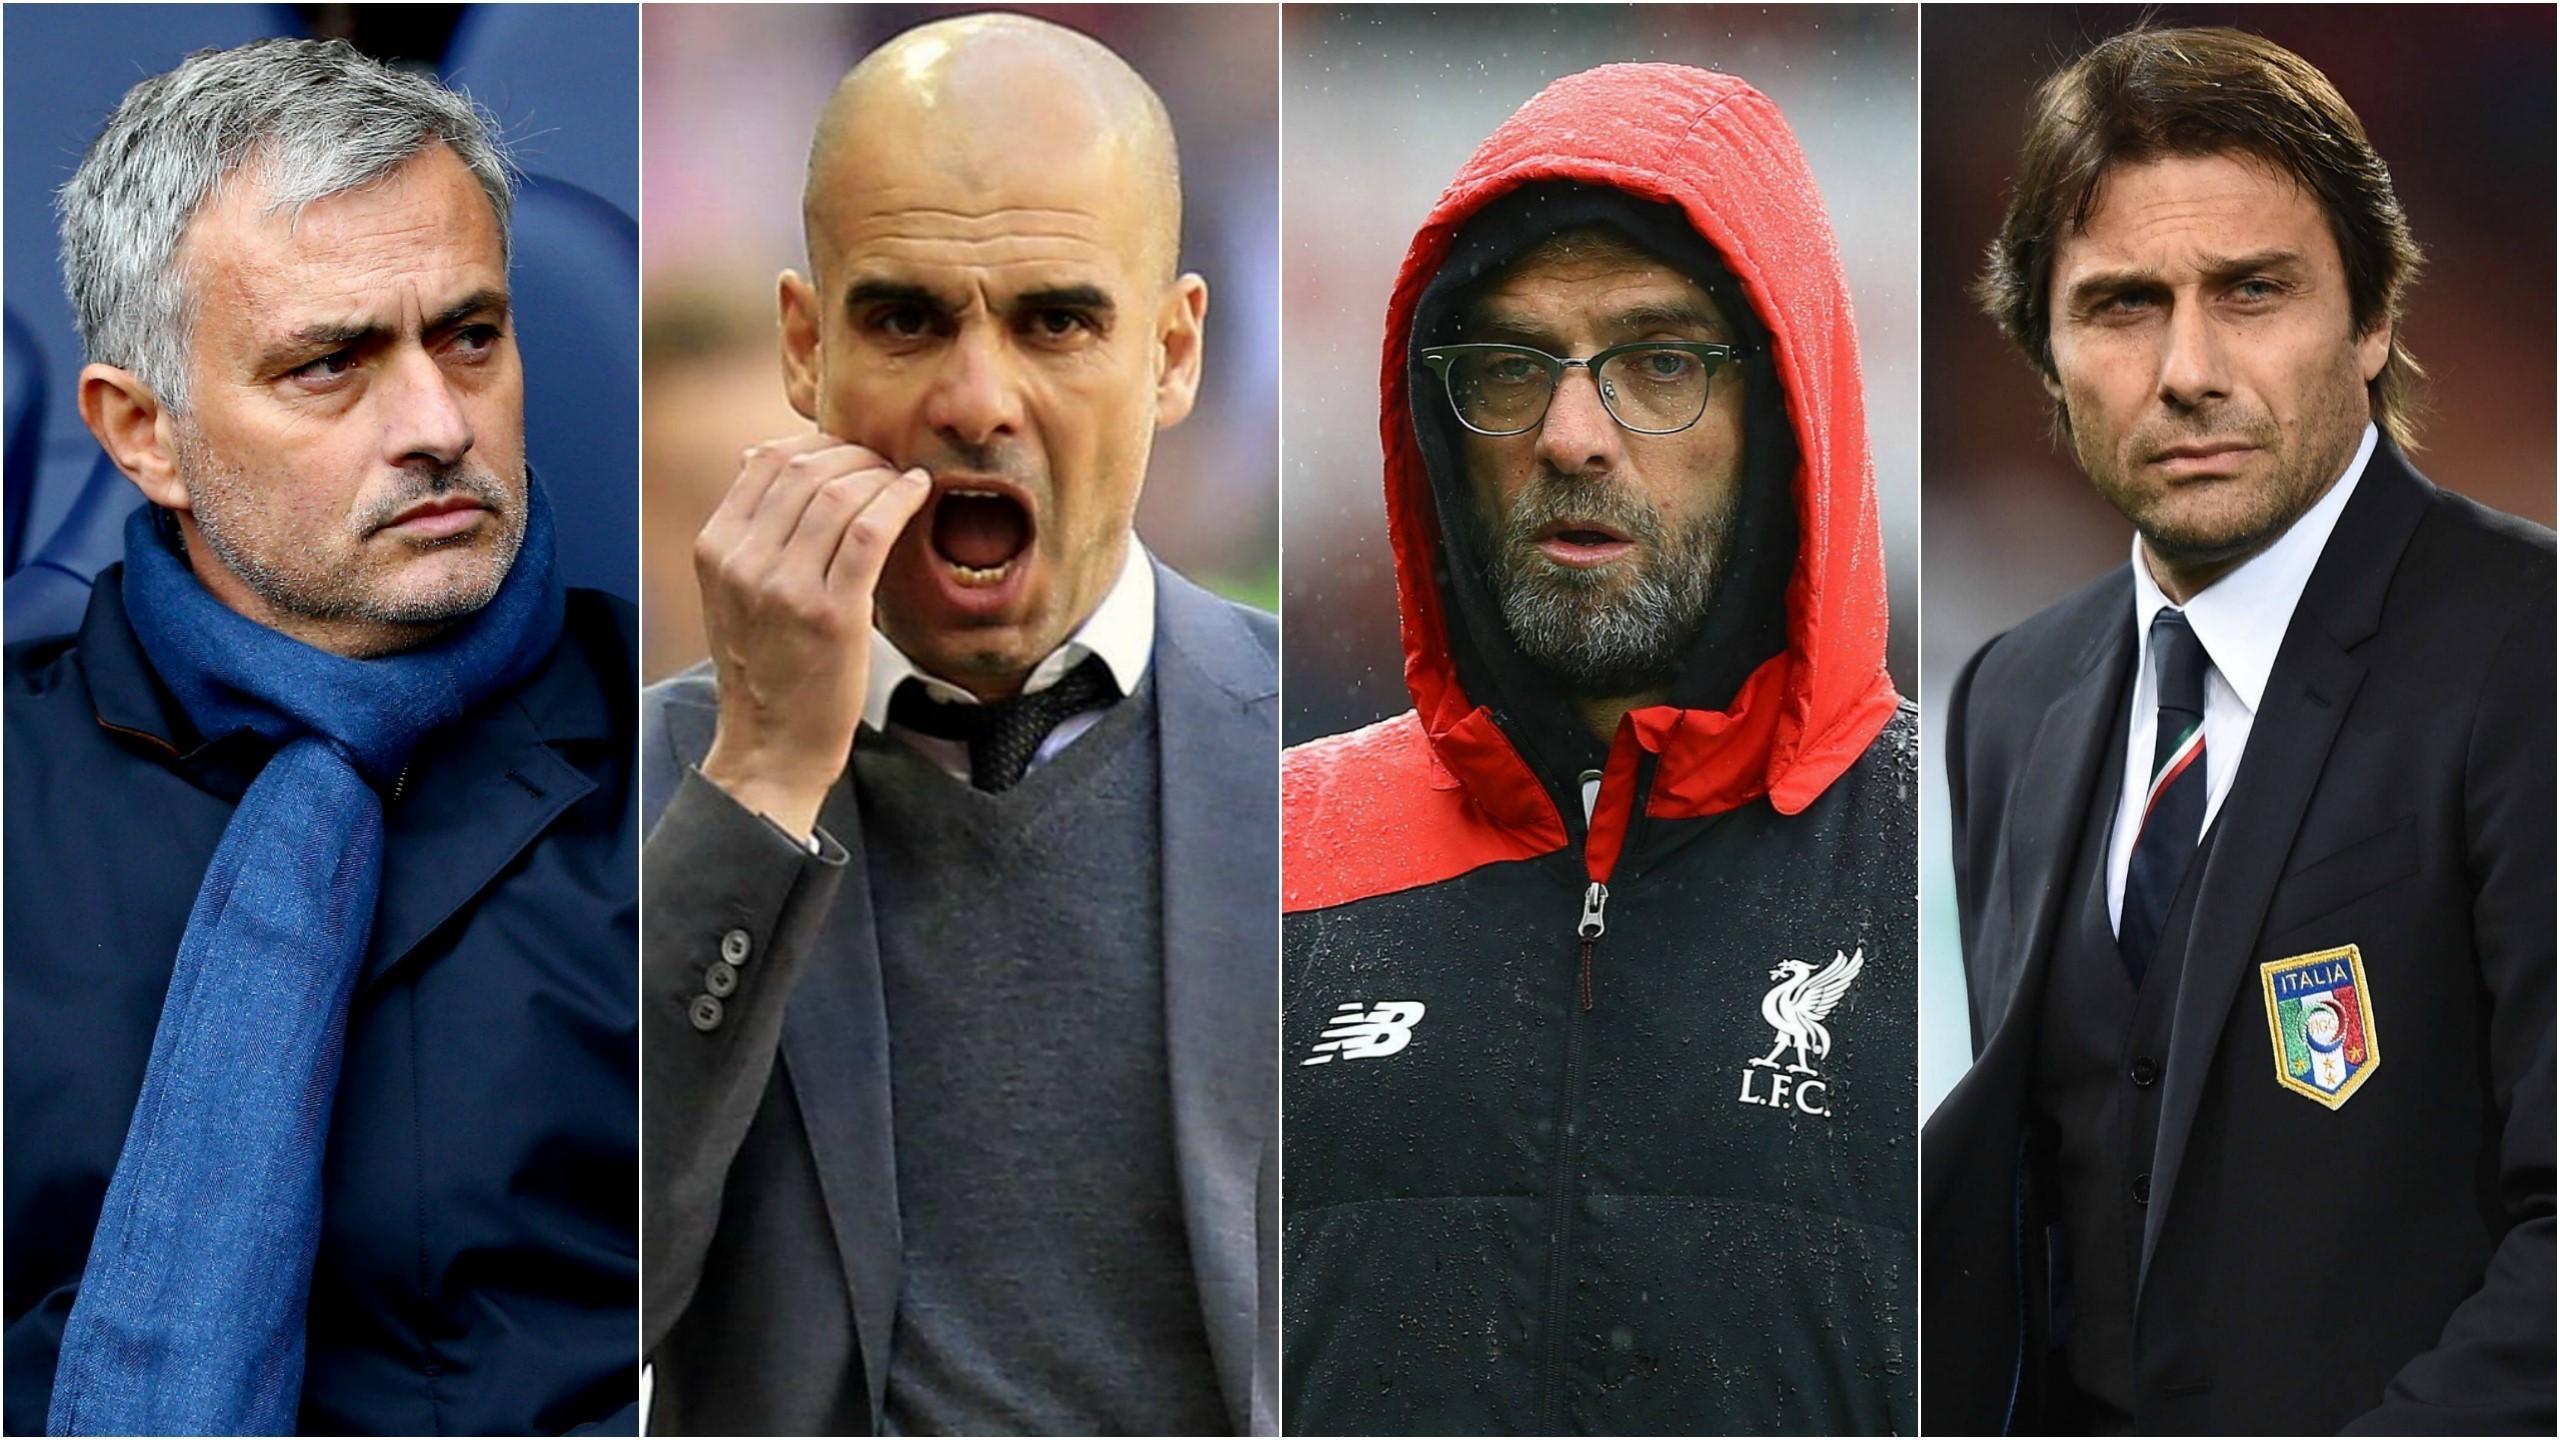 Jose Mourinho, Pep Guardiola, Jurgen Klopp and Antonio Conte